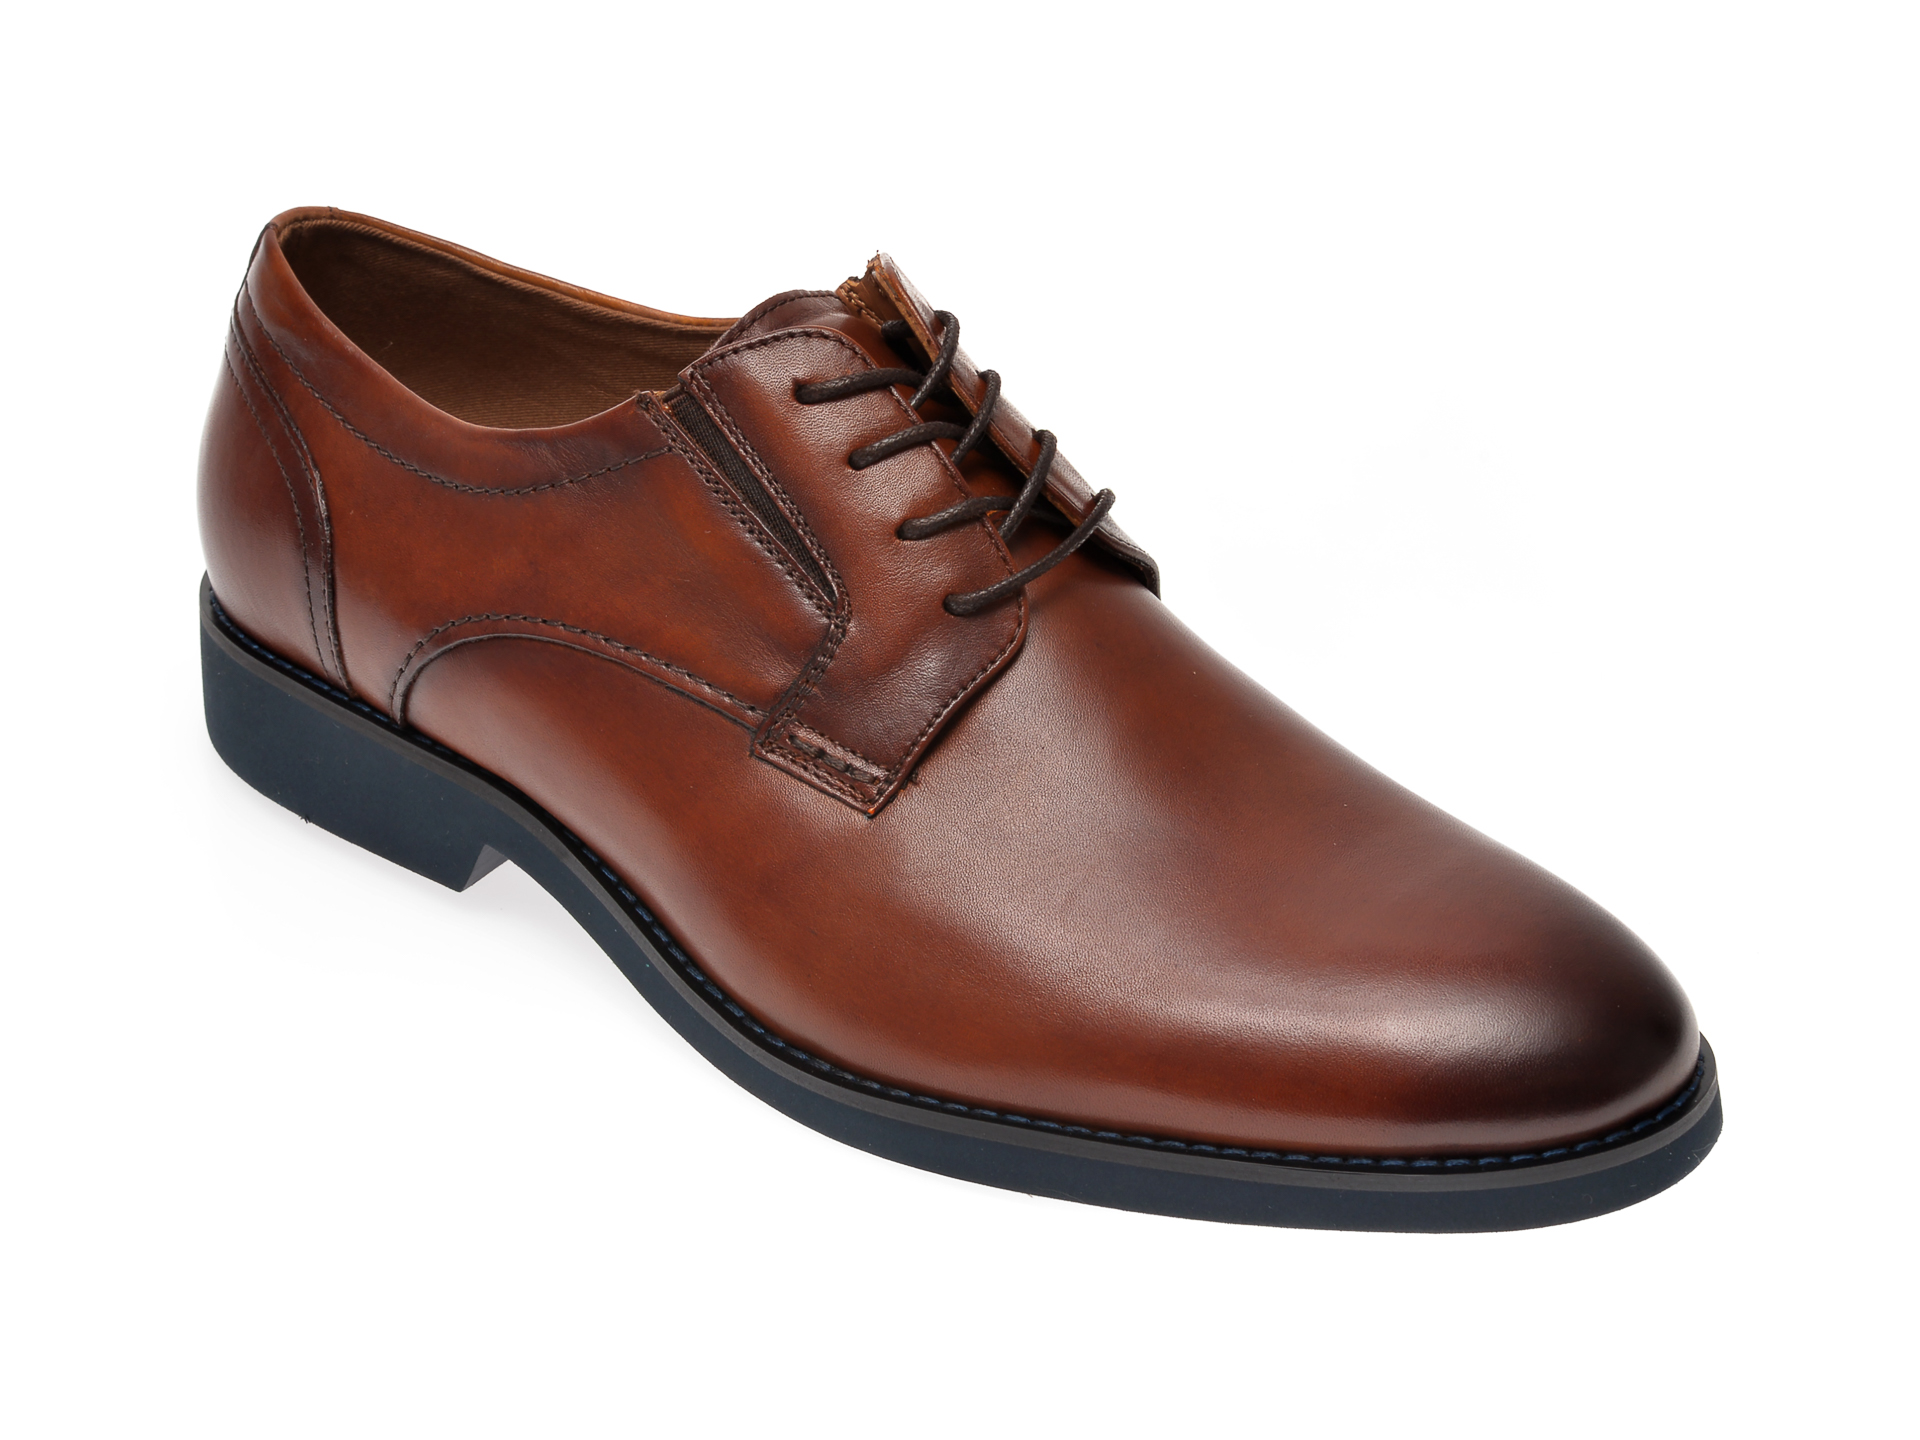 Pantofi ALDO maro, Rorelind220, din piele naturala New